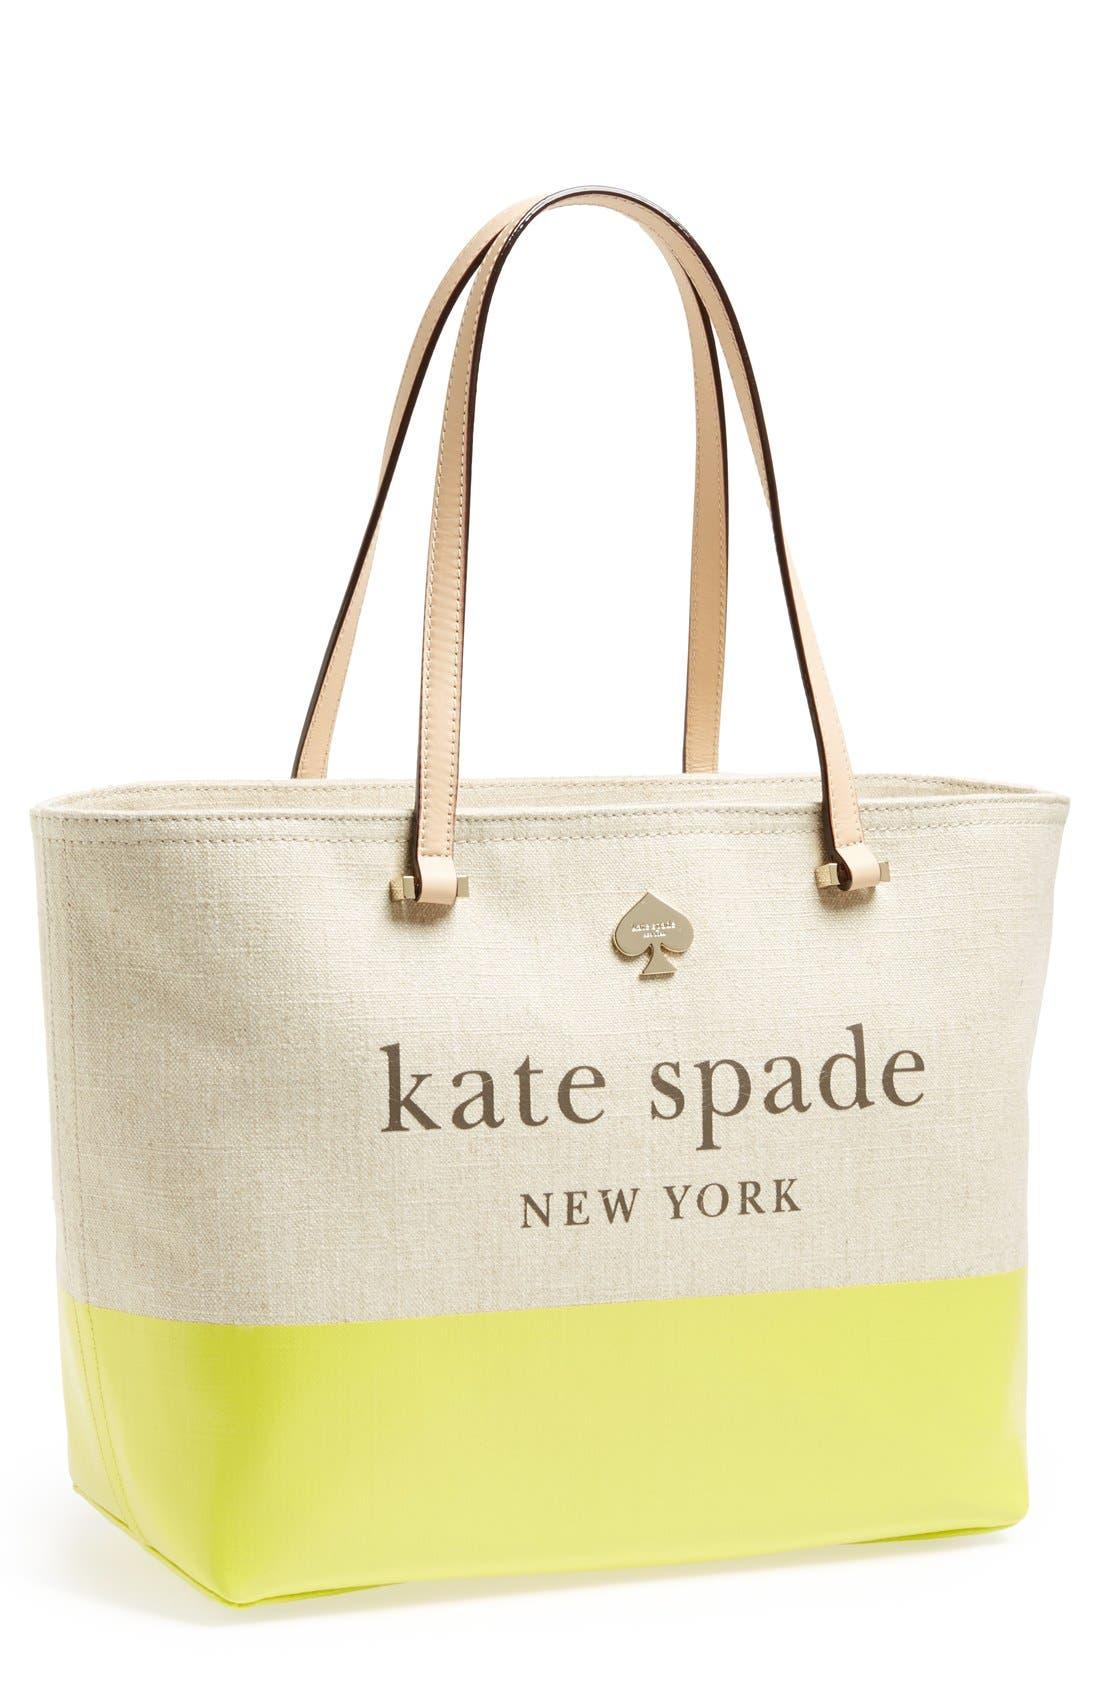 Alternate Image 1 Selected - kate spade new york 'lott street - francis' tote